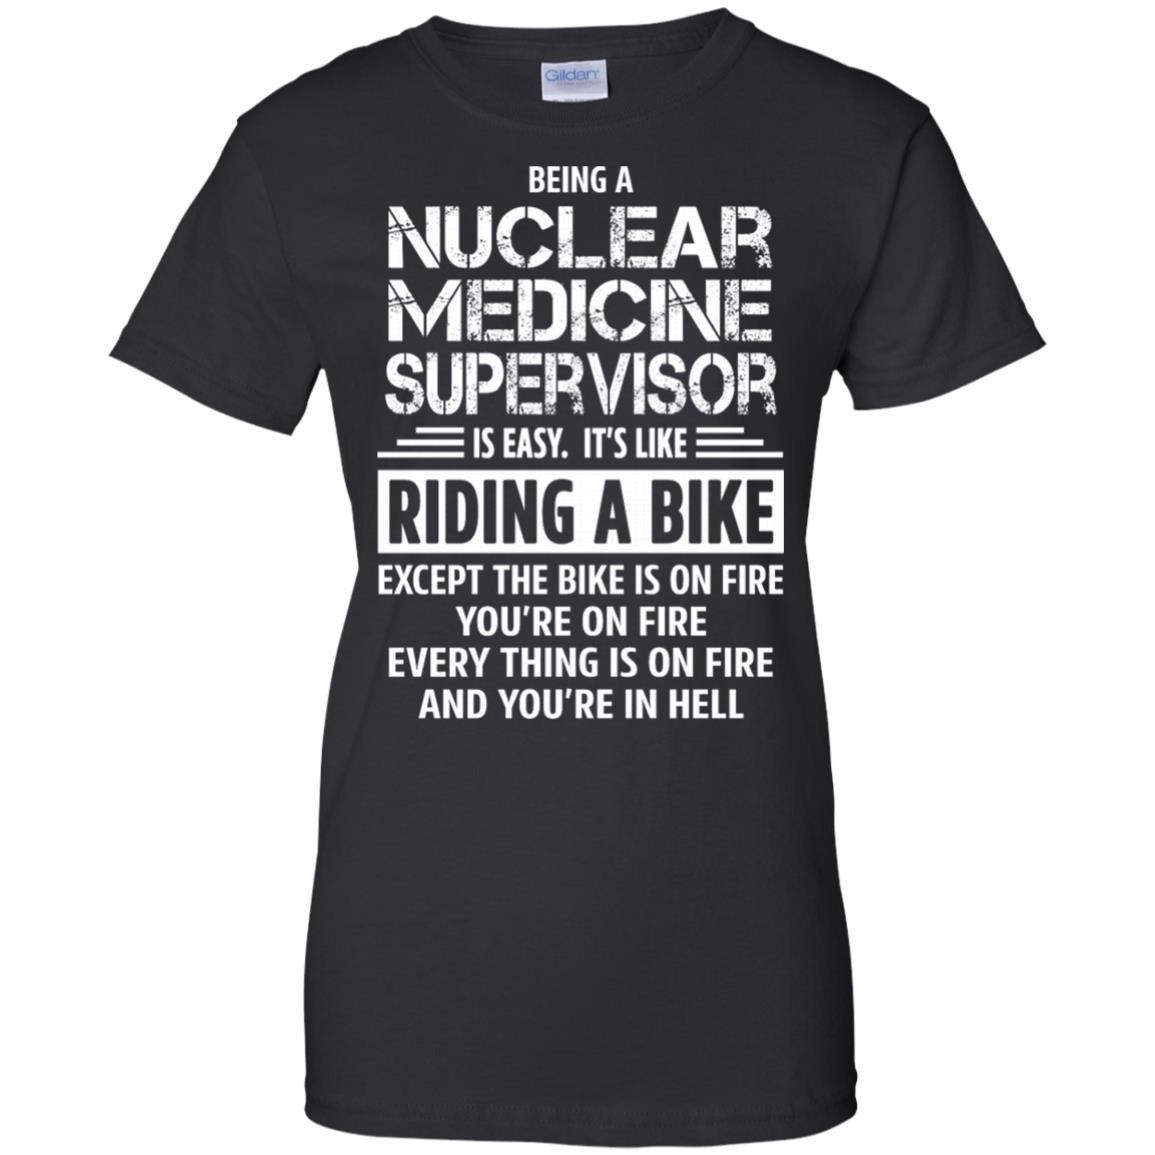 Nuclear Medicine Supervisor T-Shirt Women